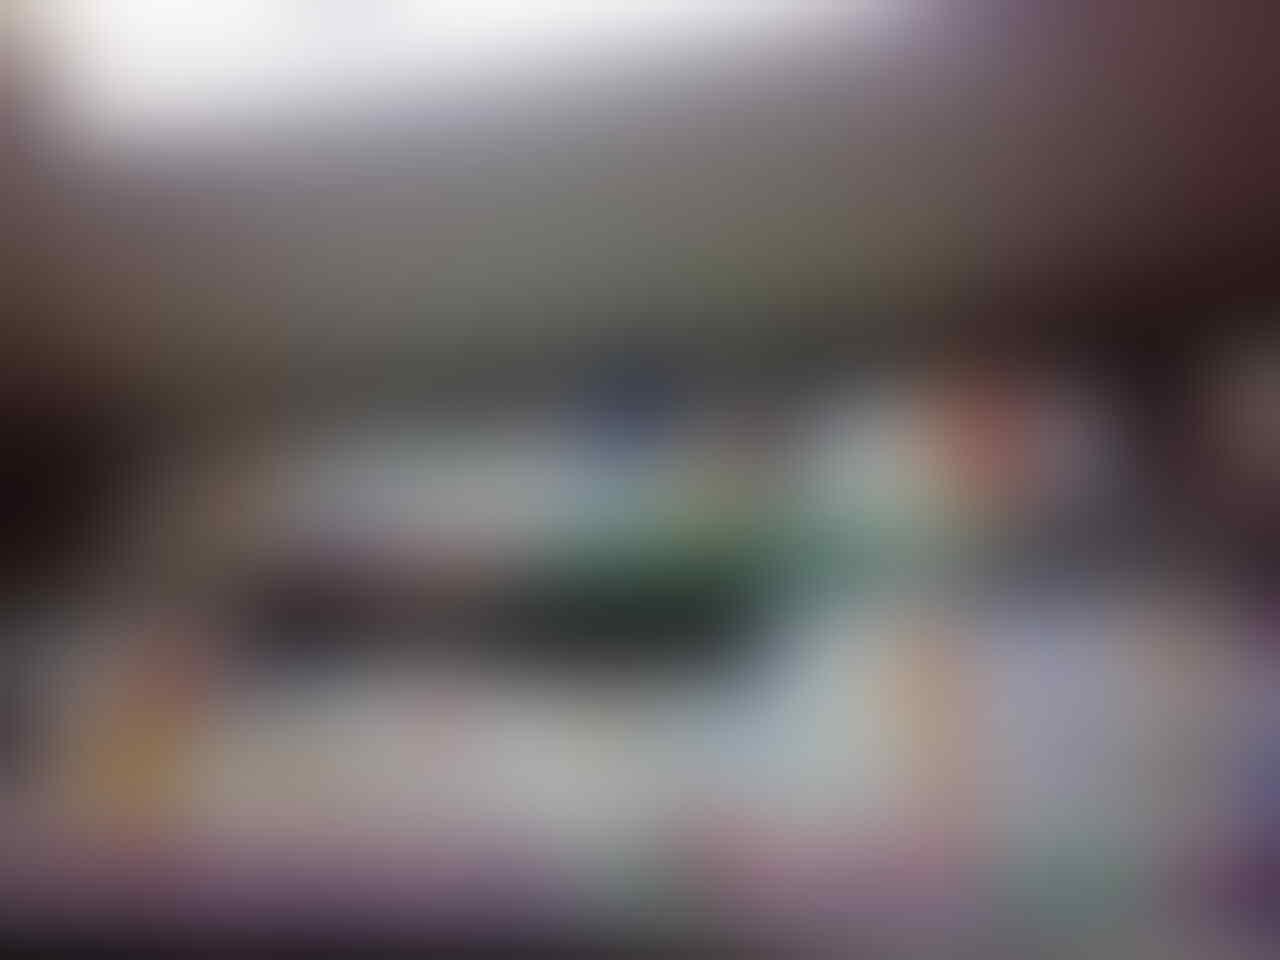 SURYA GEMILANG: Cooker Hood Modena PX6001, SX6501V, SX6001S, SX6501S ASli dan Baru